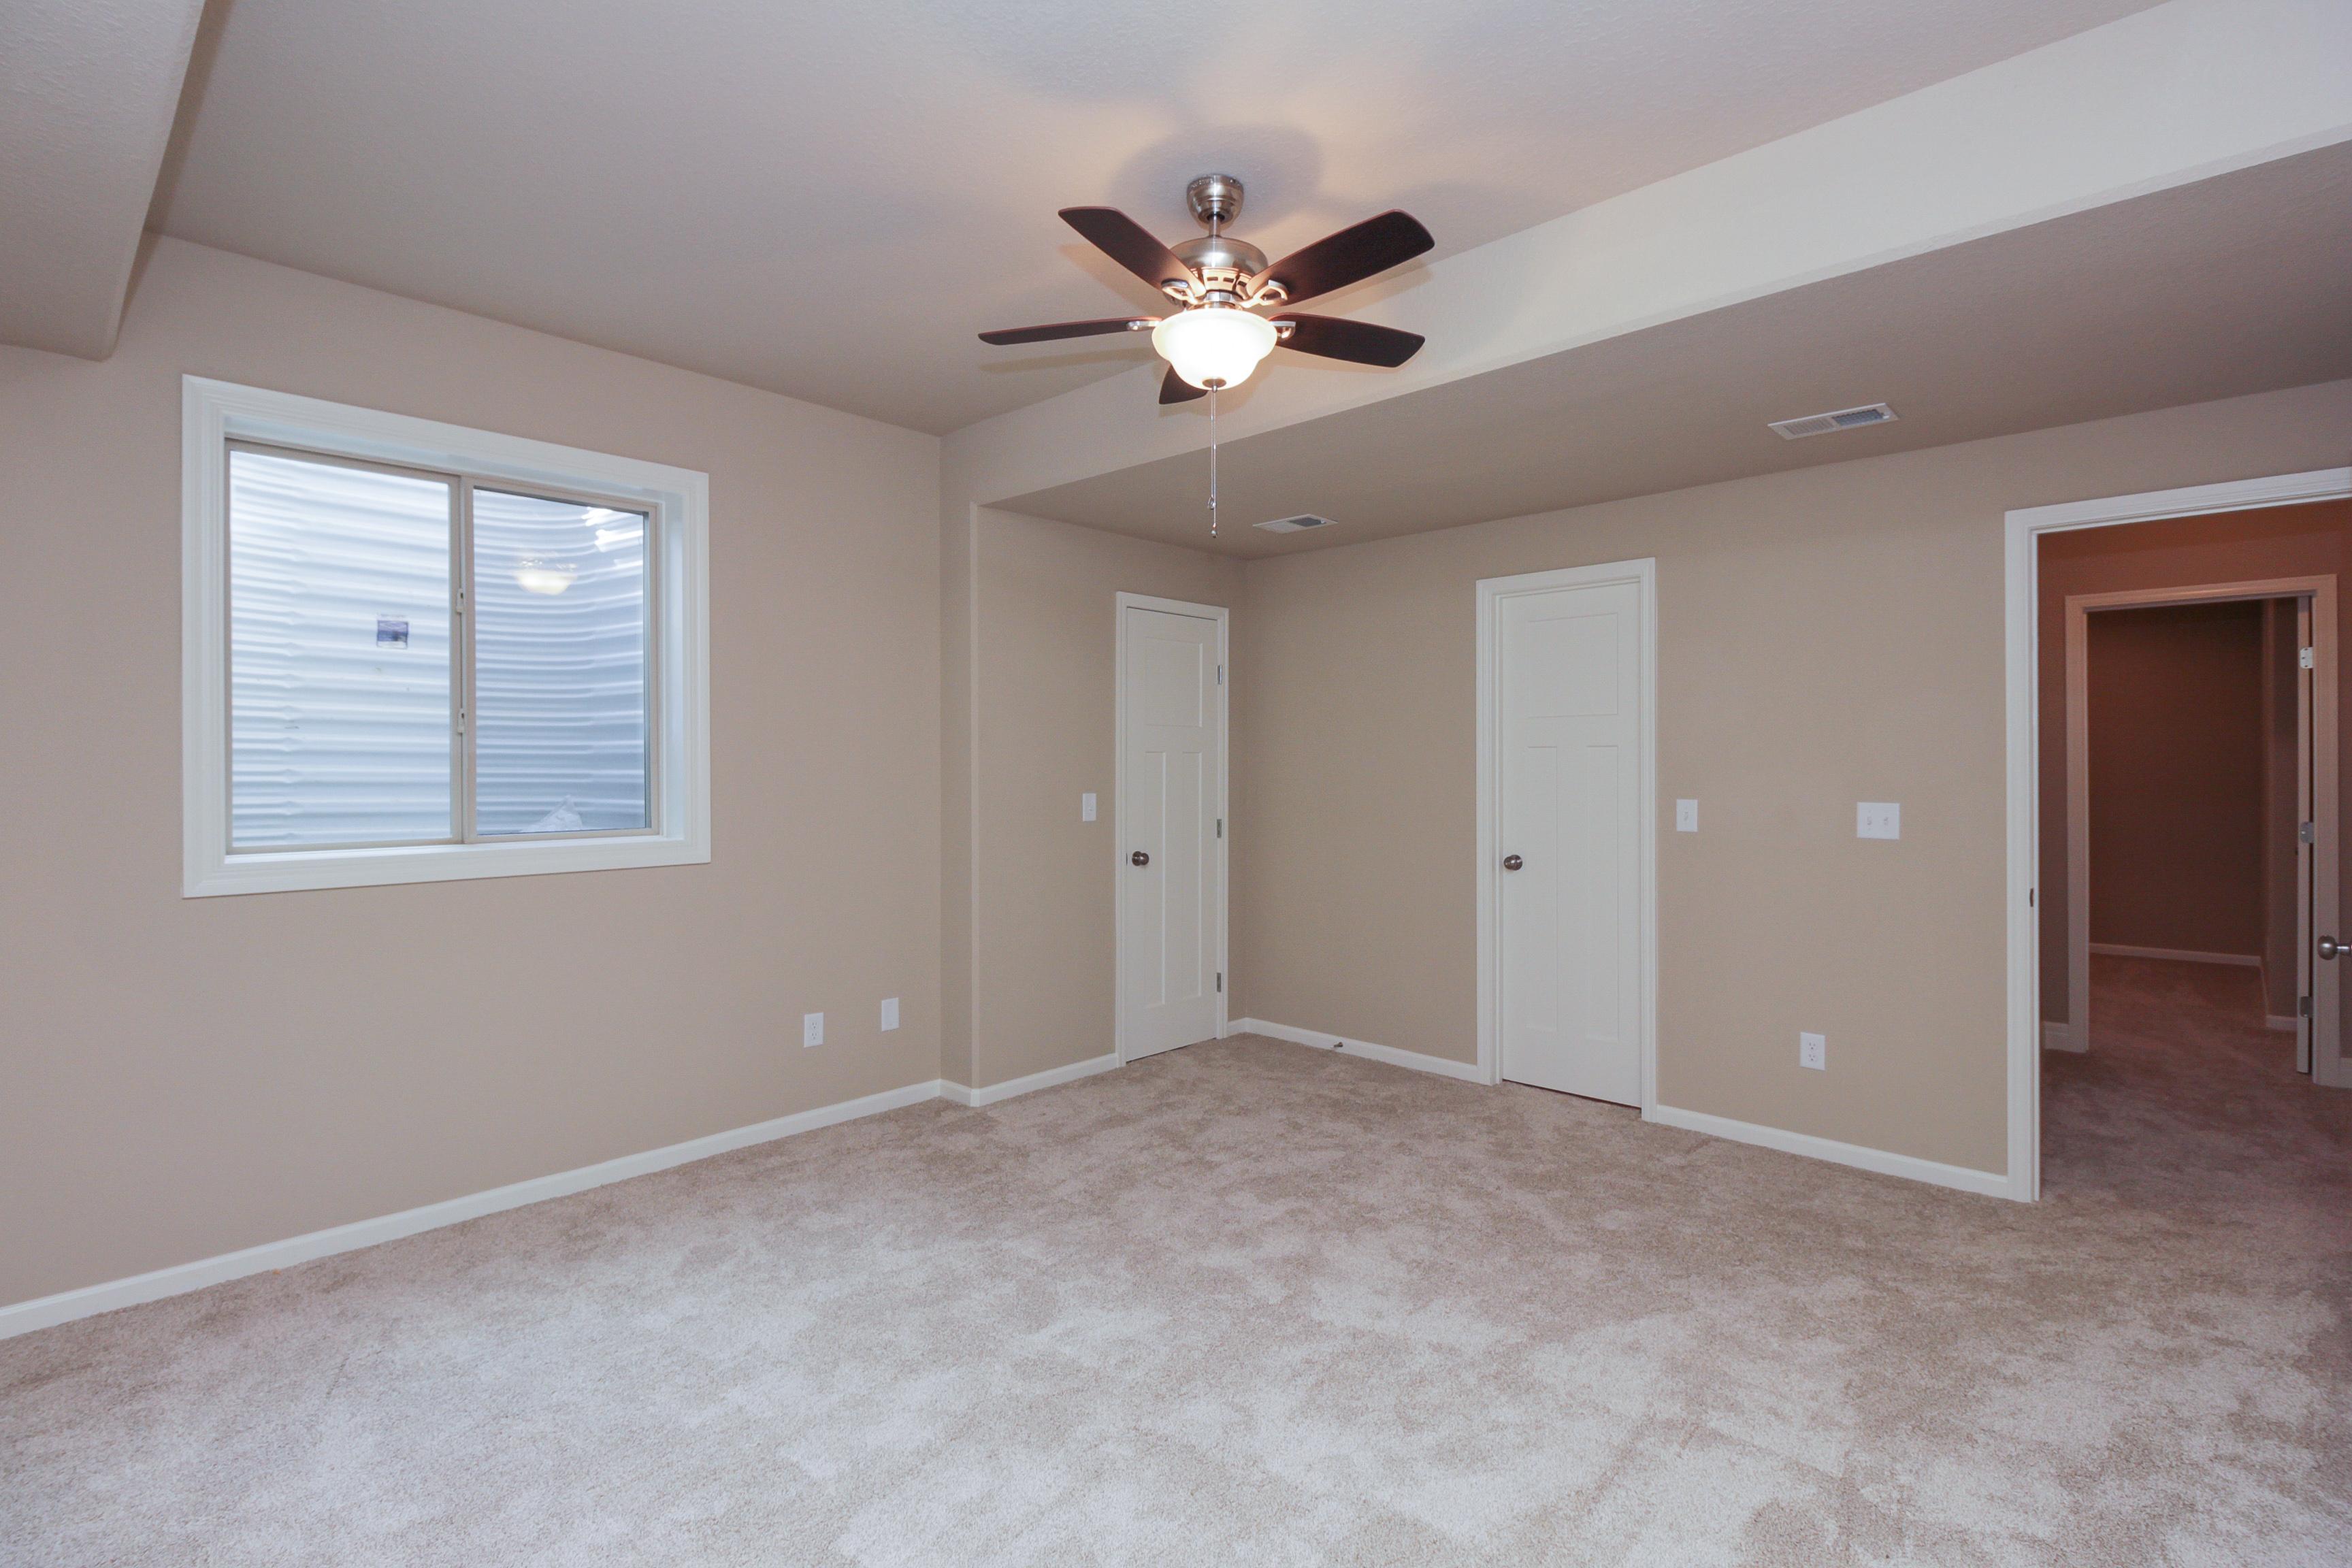 031_Lower Level Bedroom 2